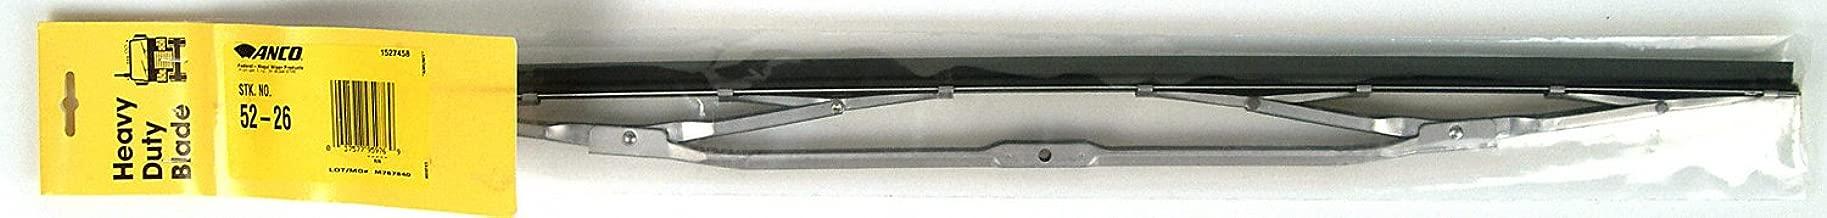 Anco 5226 Heavy Duty Curved Wiper, 26